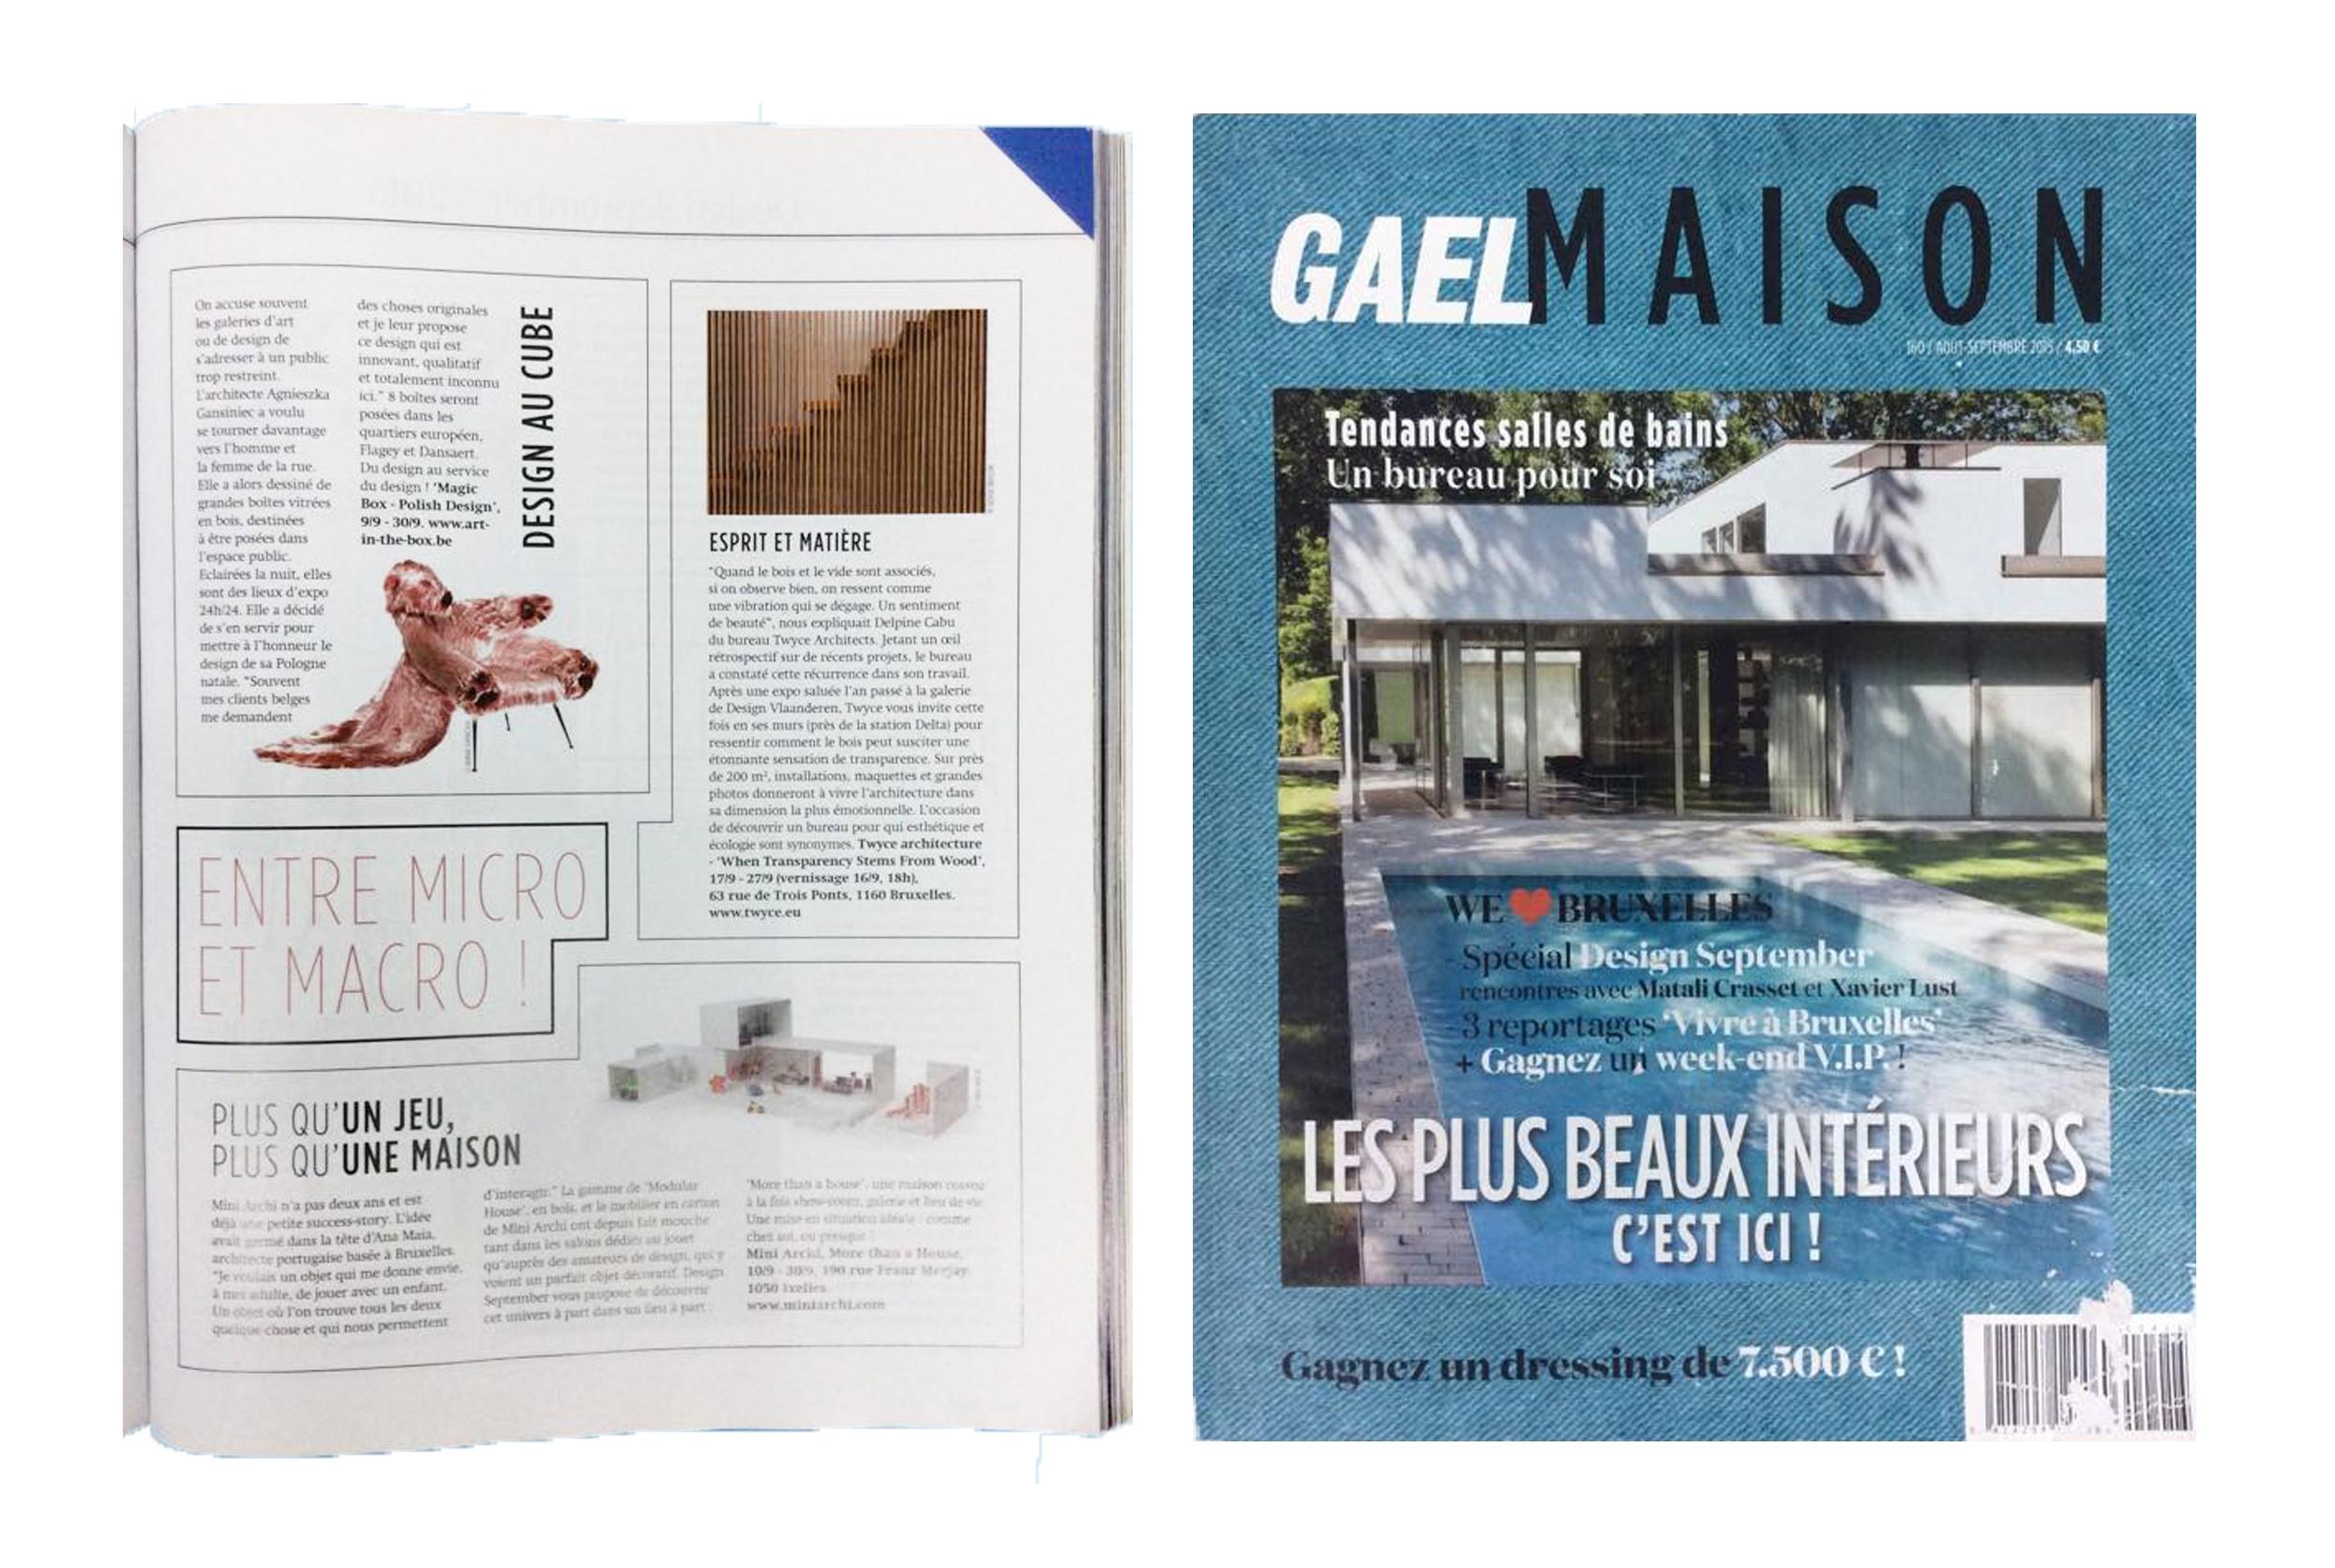 Gael Maison - Gael Maison BelgiumSeptember 2015